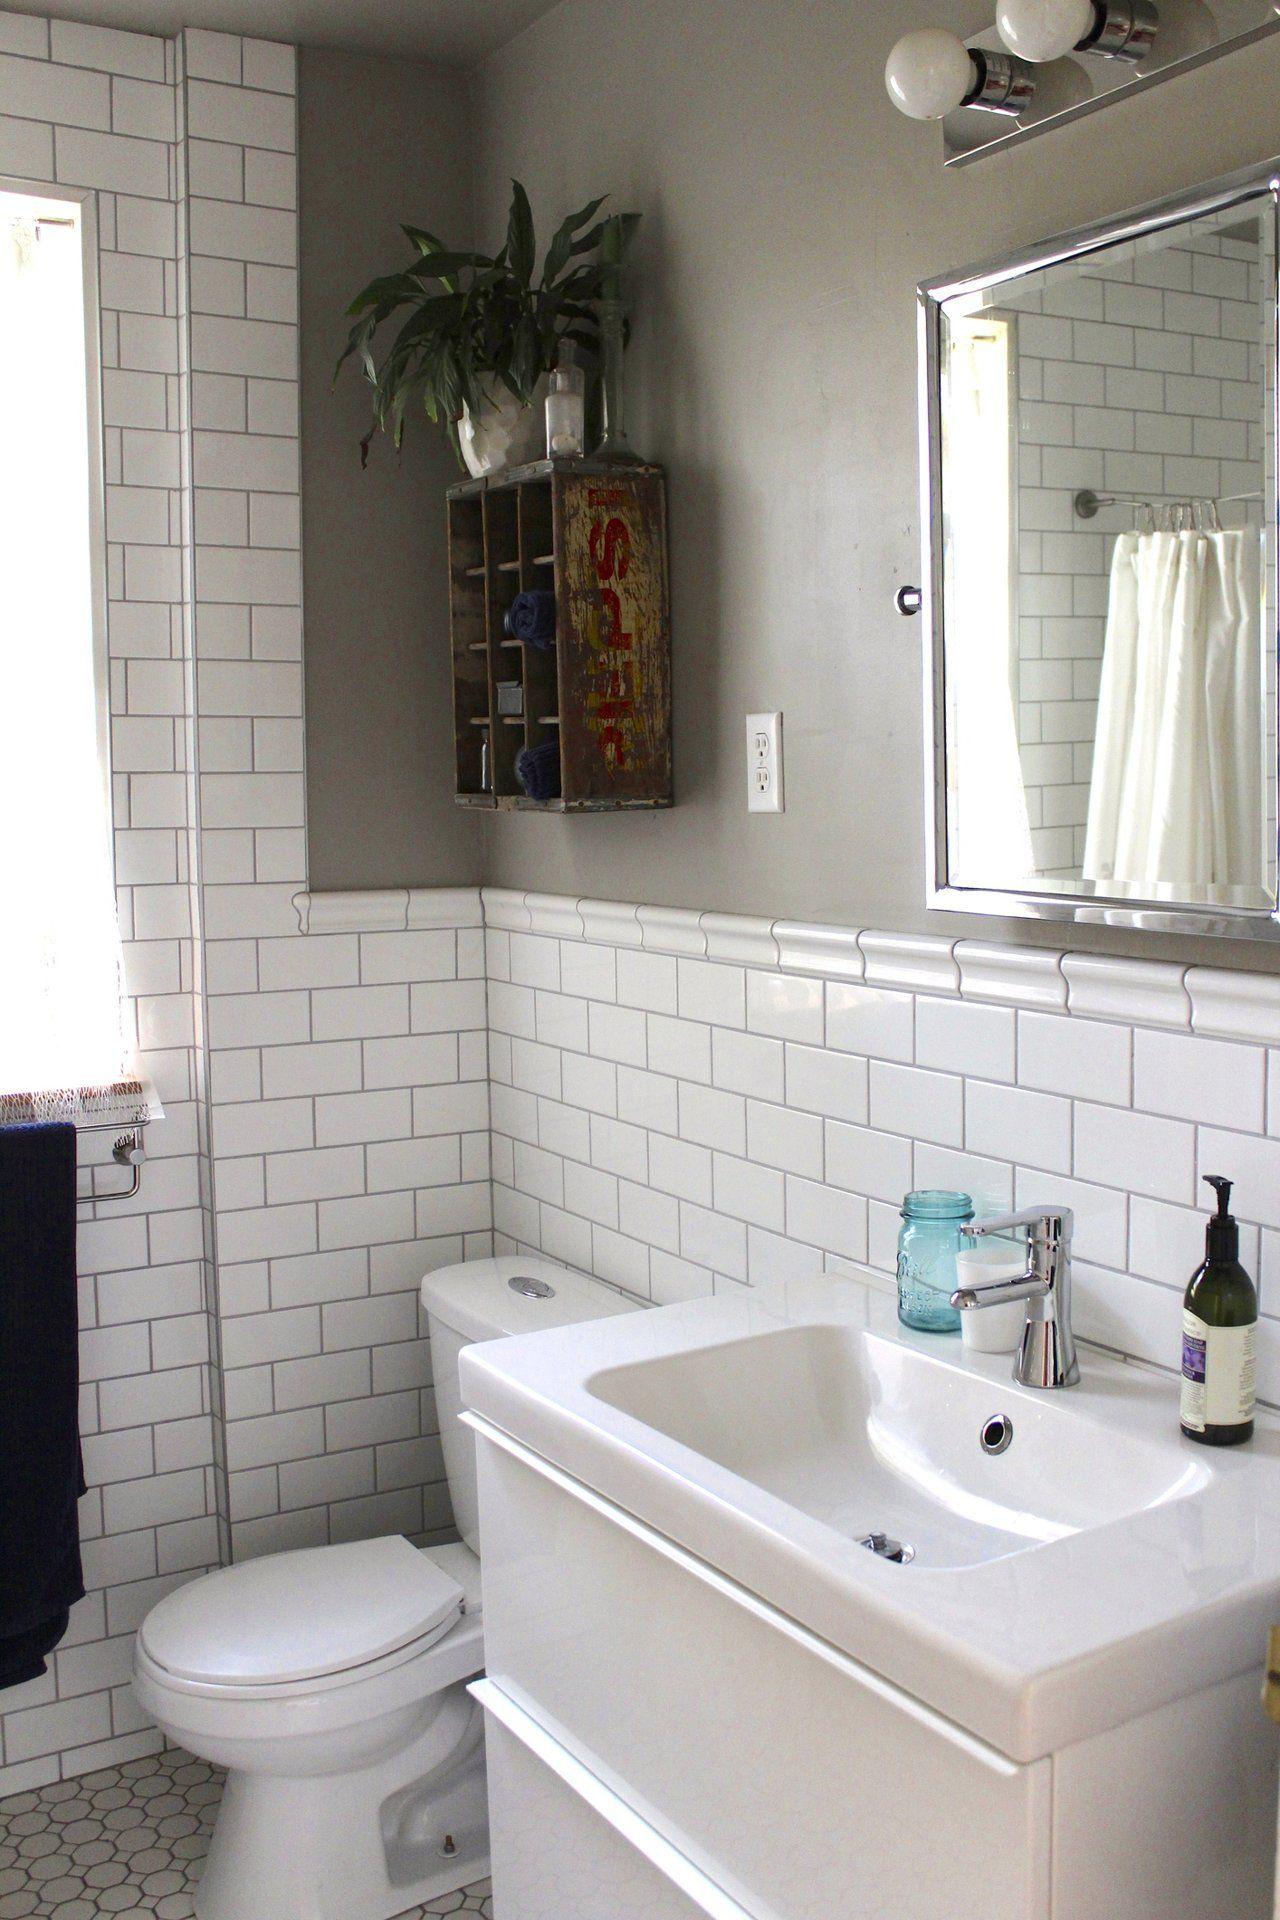 Heather & Eric\'s Cozy Victoria Cottage | Cozy, Sinks and Crates